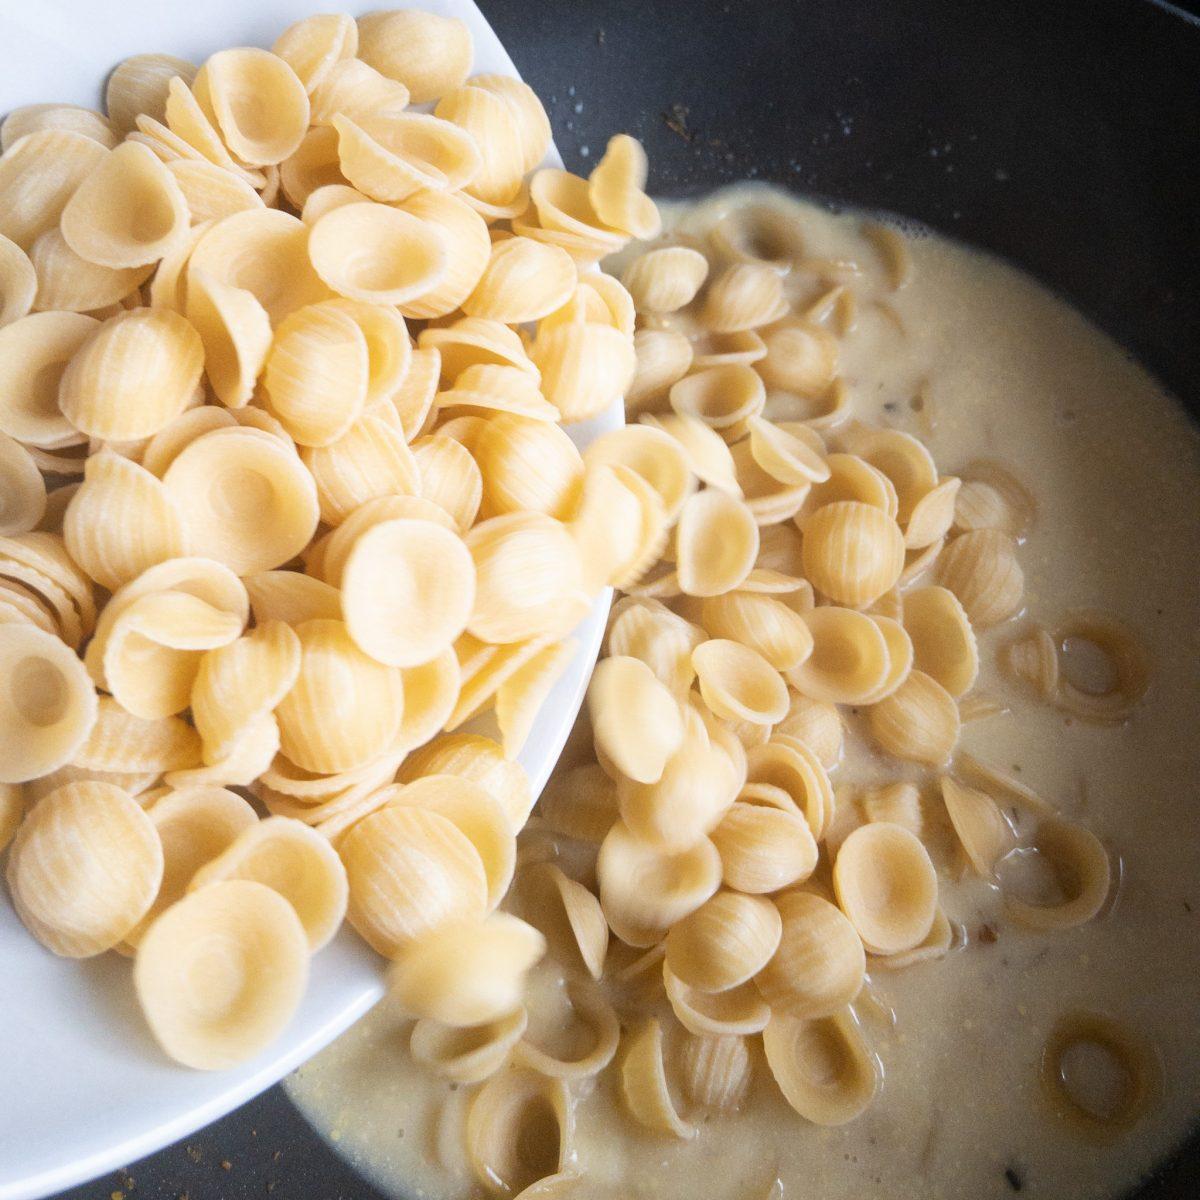 Recette_pâtes_sauce_moutarde00015